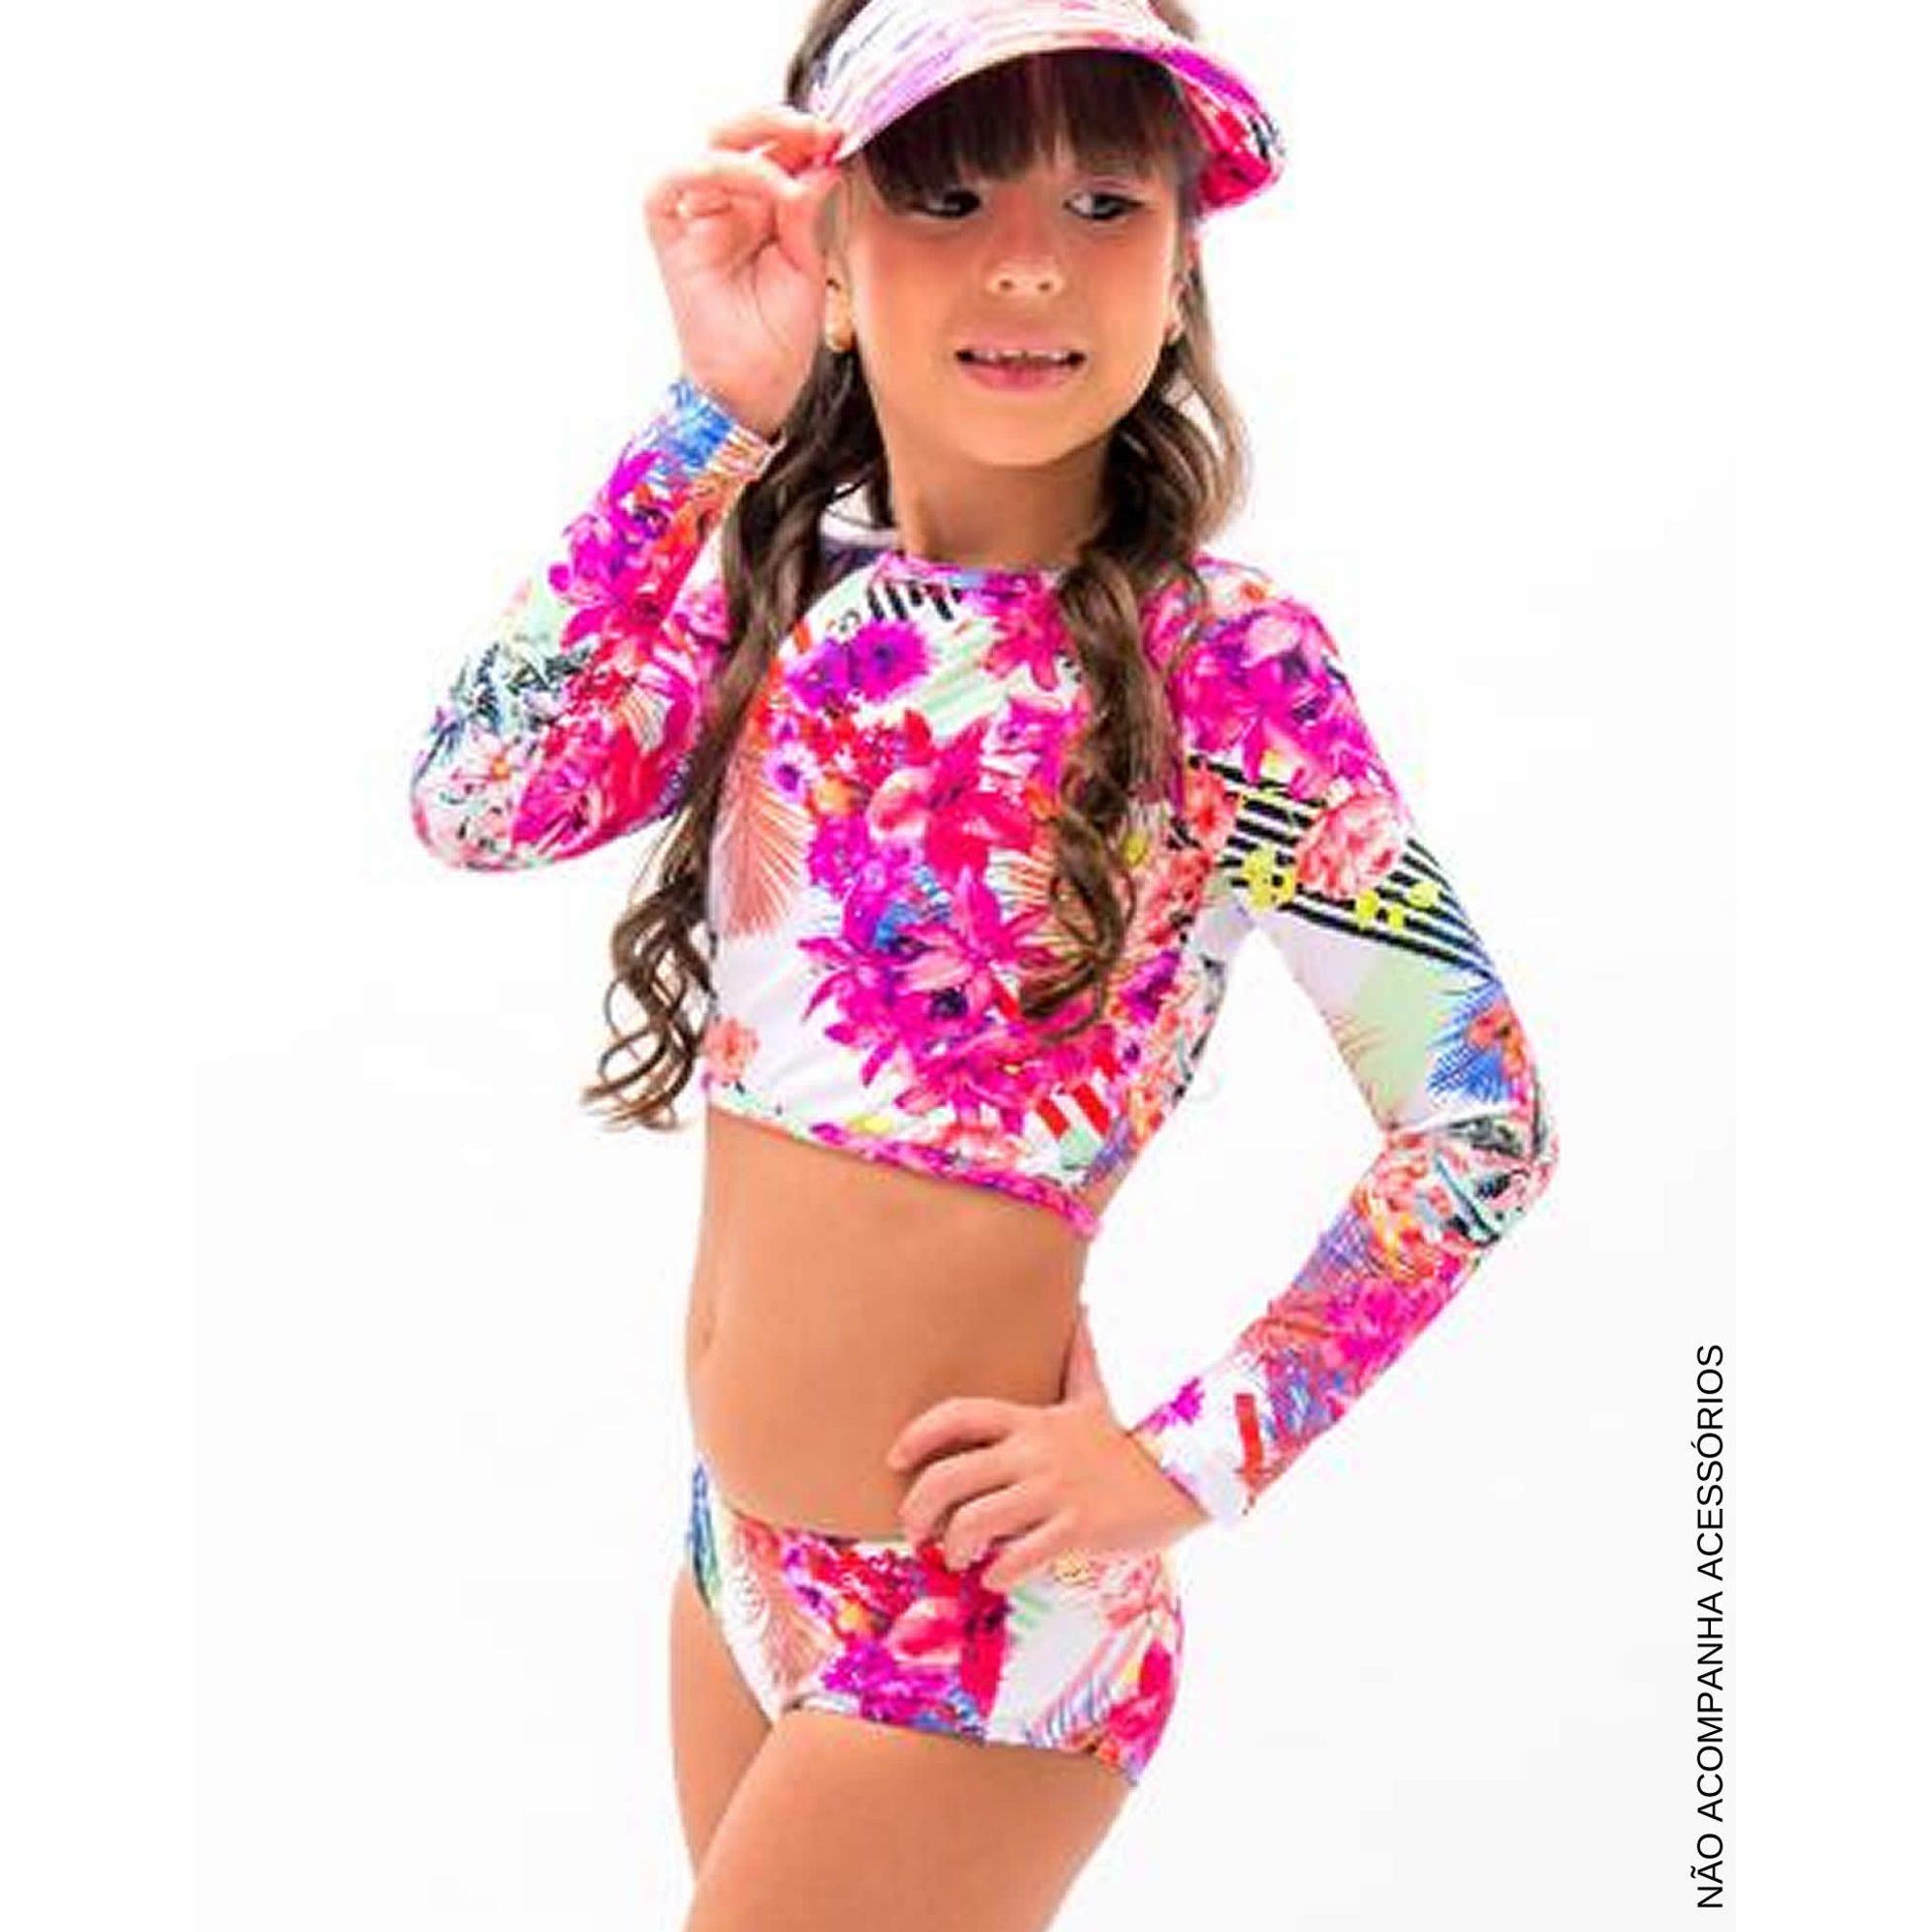 7cd43f9d1c37 Moda Praia Infantil Biquíni Cropped Flores Pink e Decote Costas - EcaMeleca